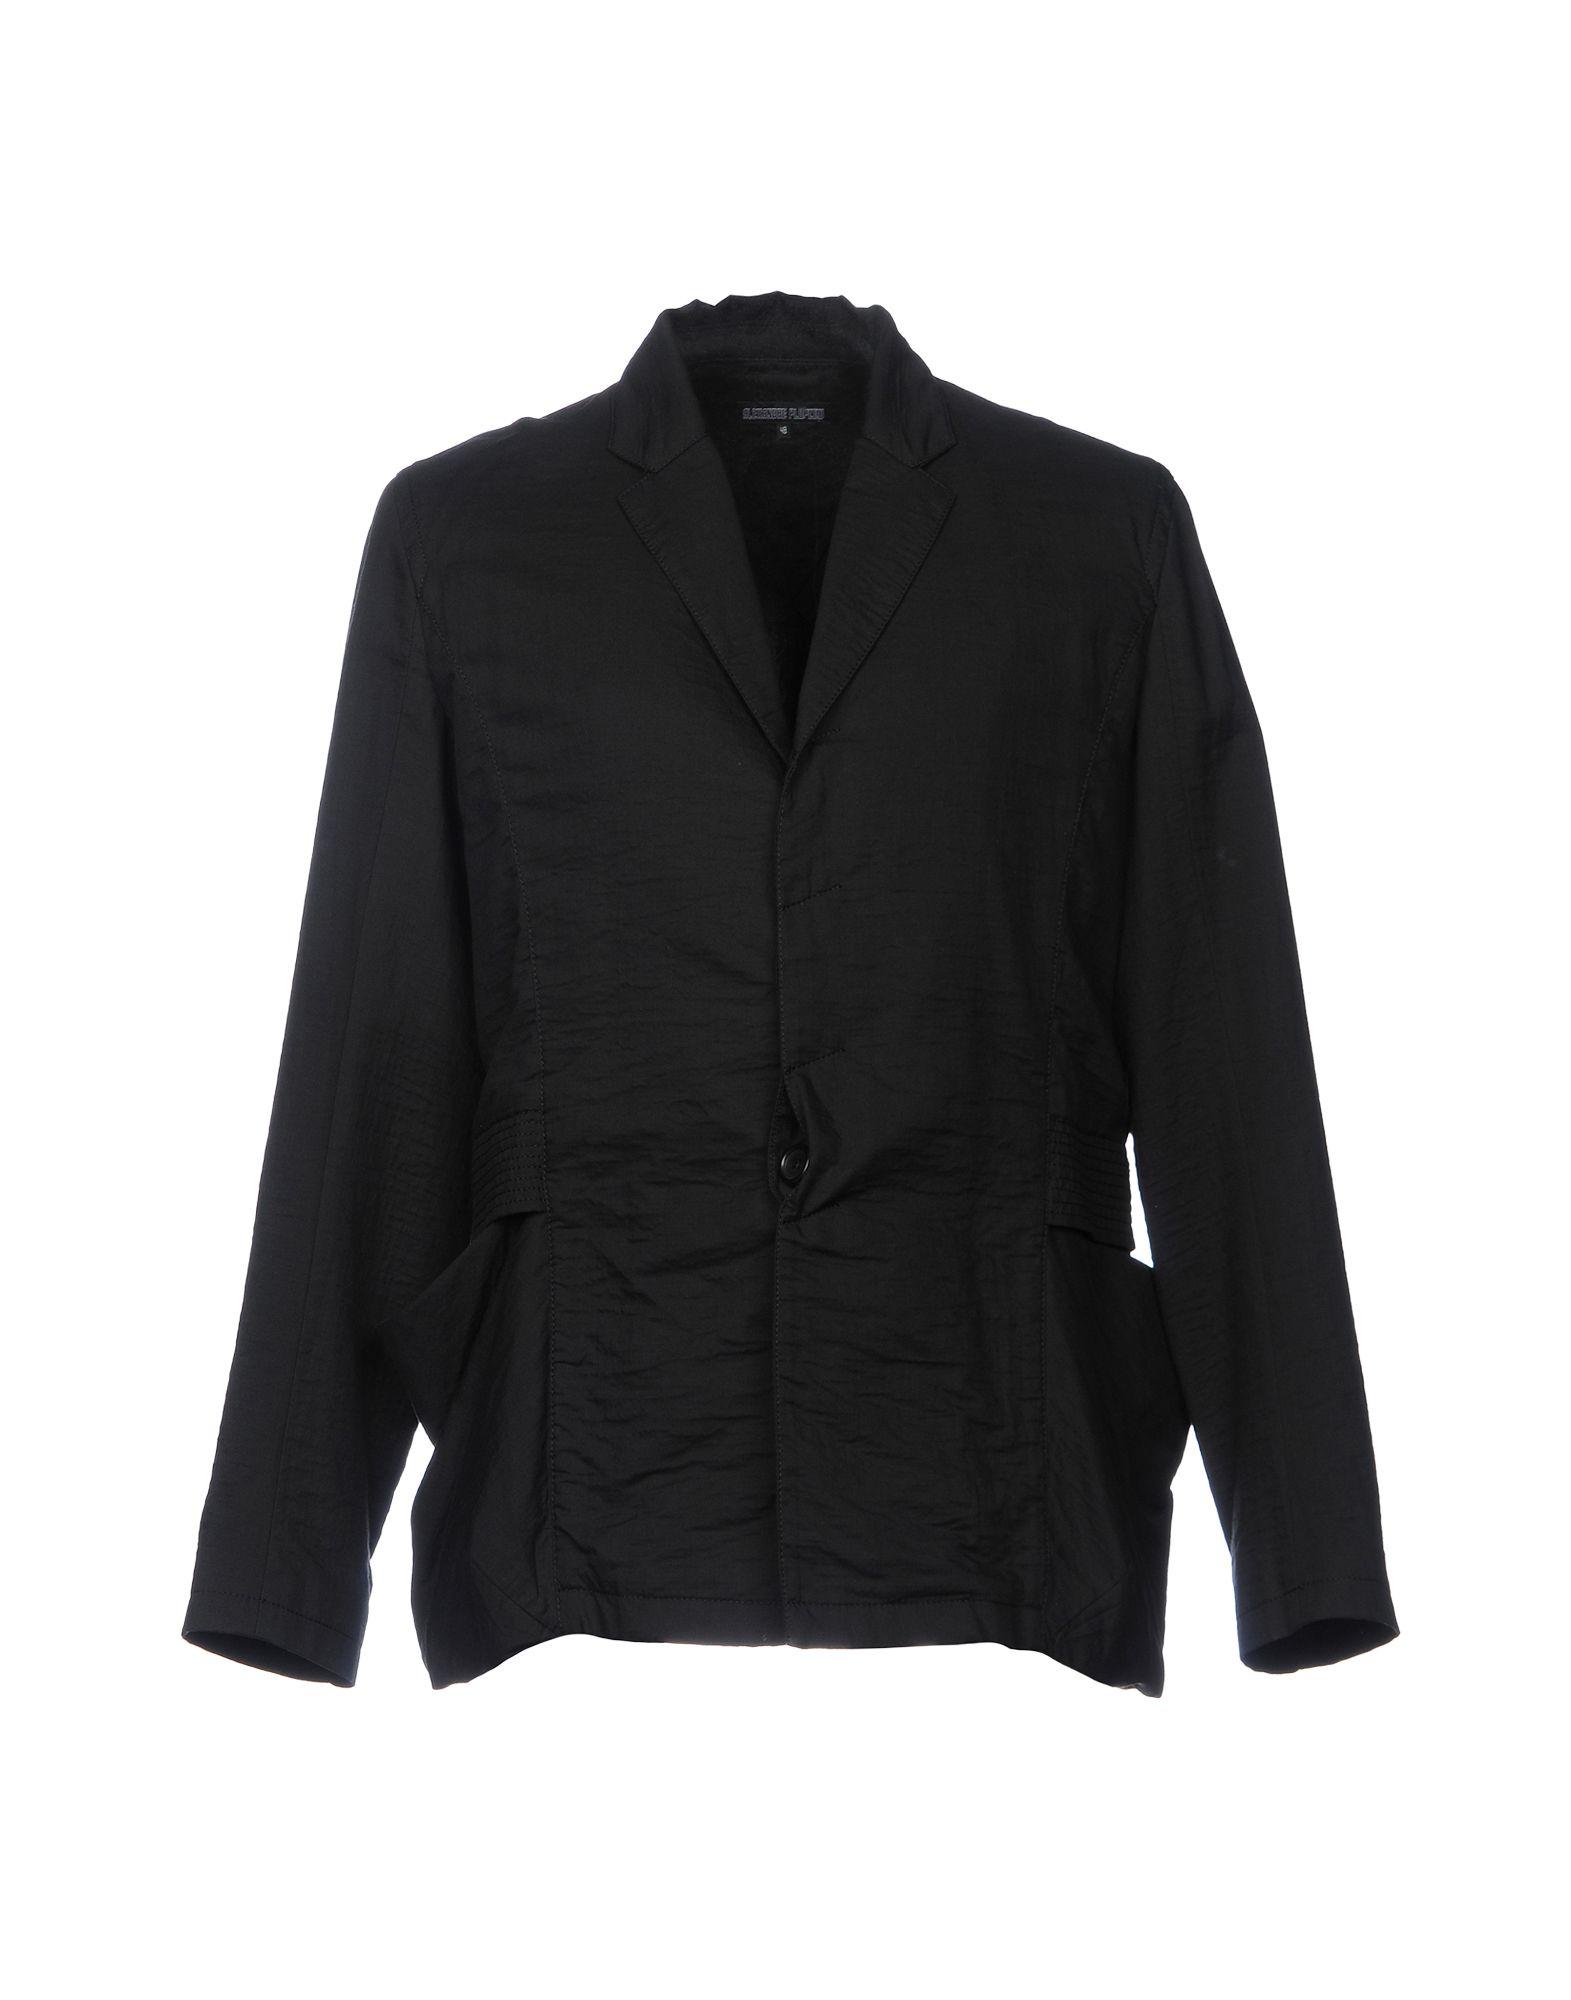 ALEXANDRE PLOKHOV Blazer in Black